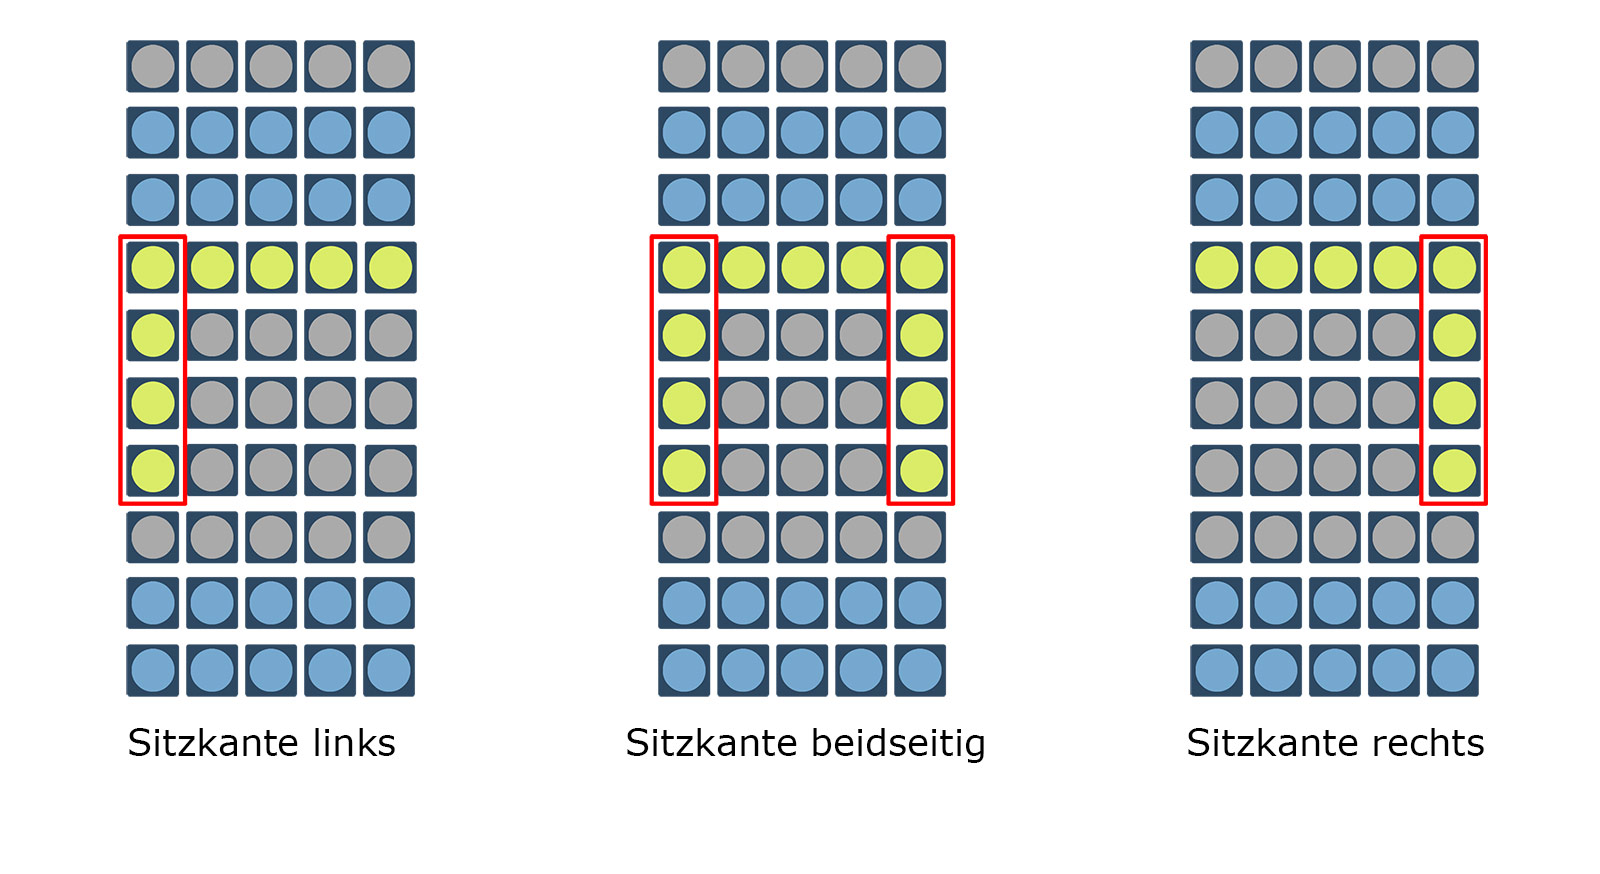 Grafik zur Sitzkanten-Position der orthowell Lattenroste